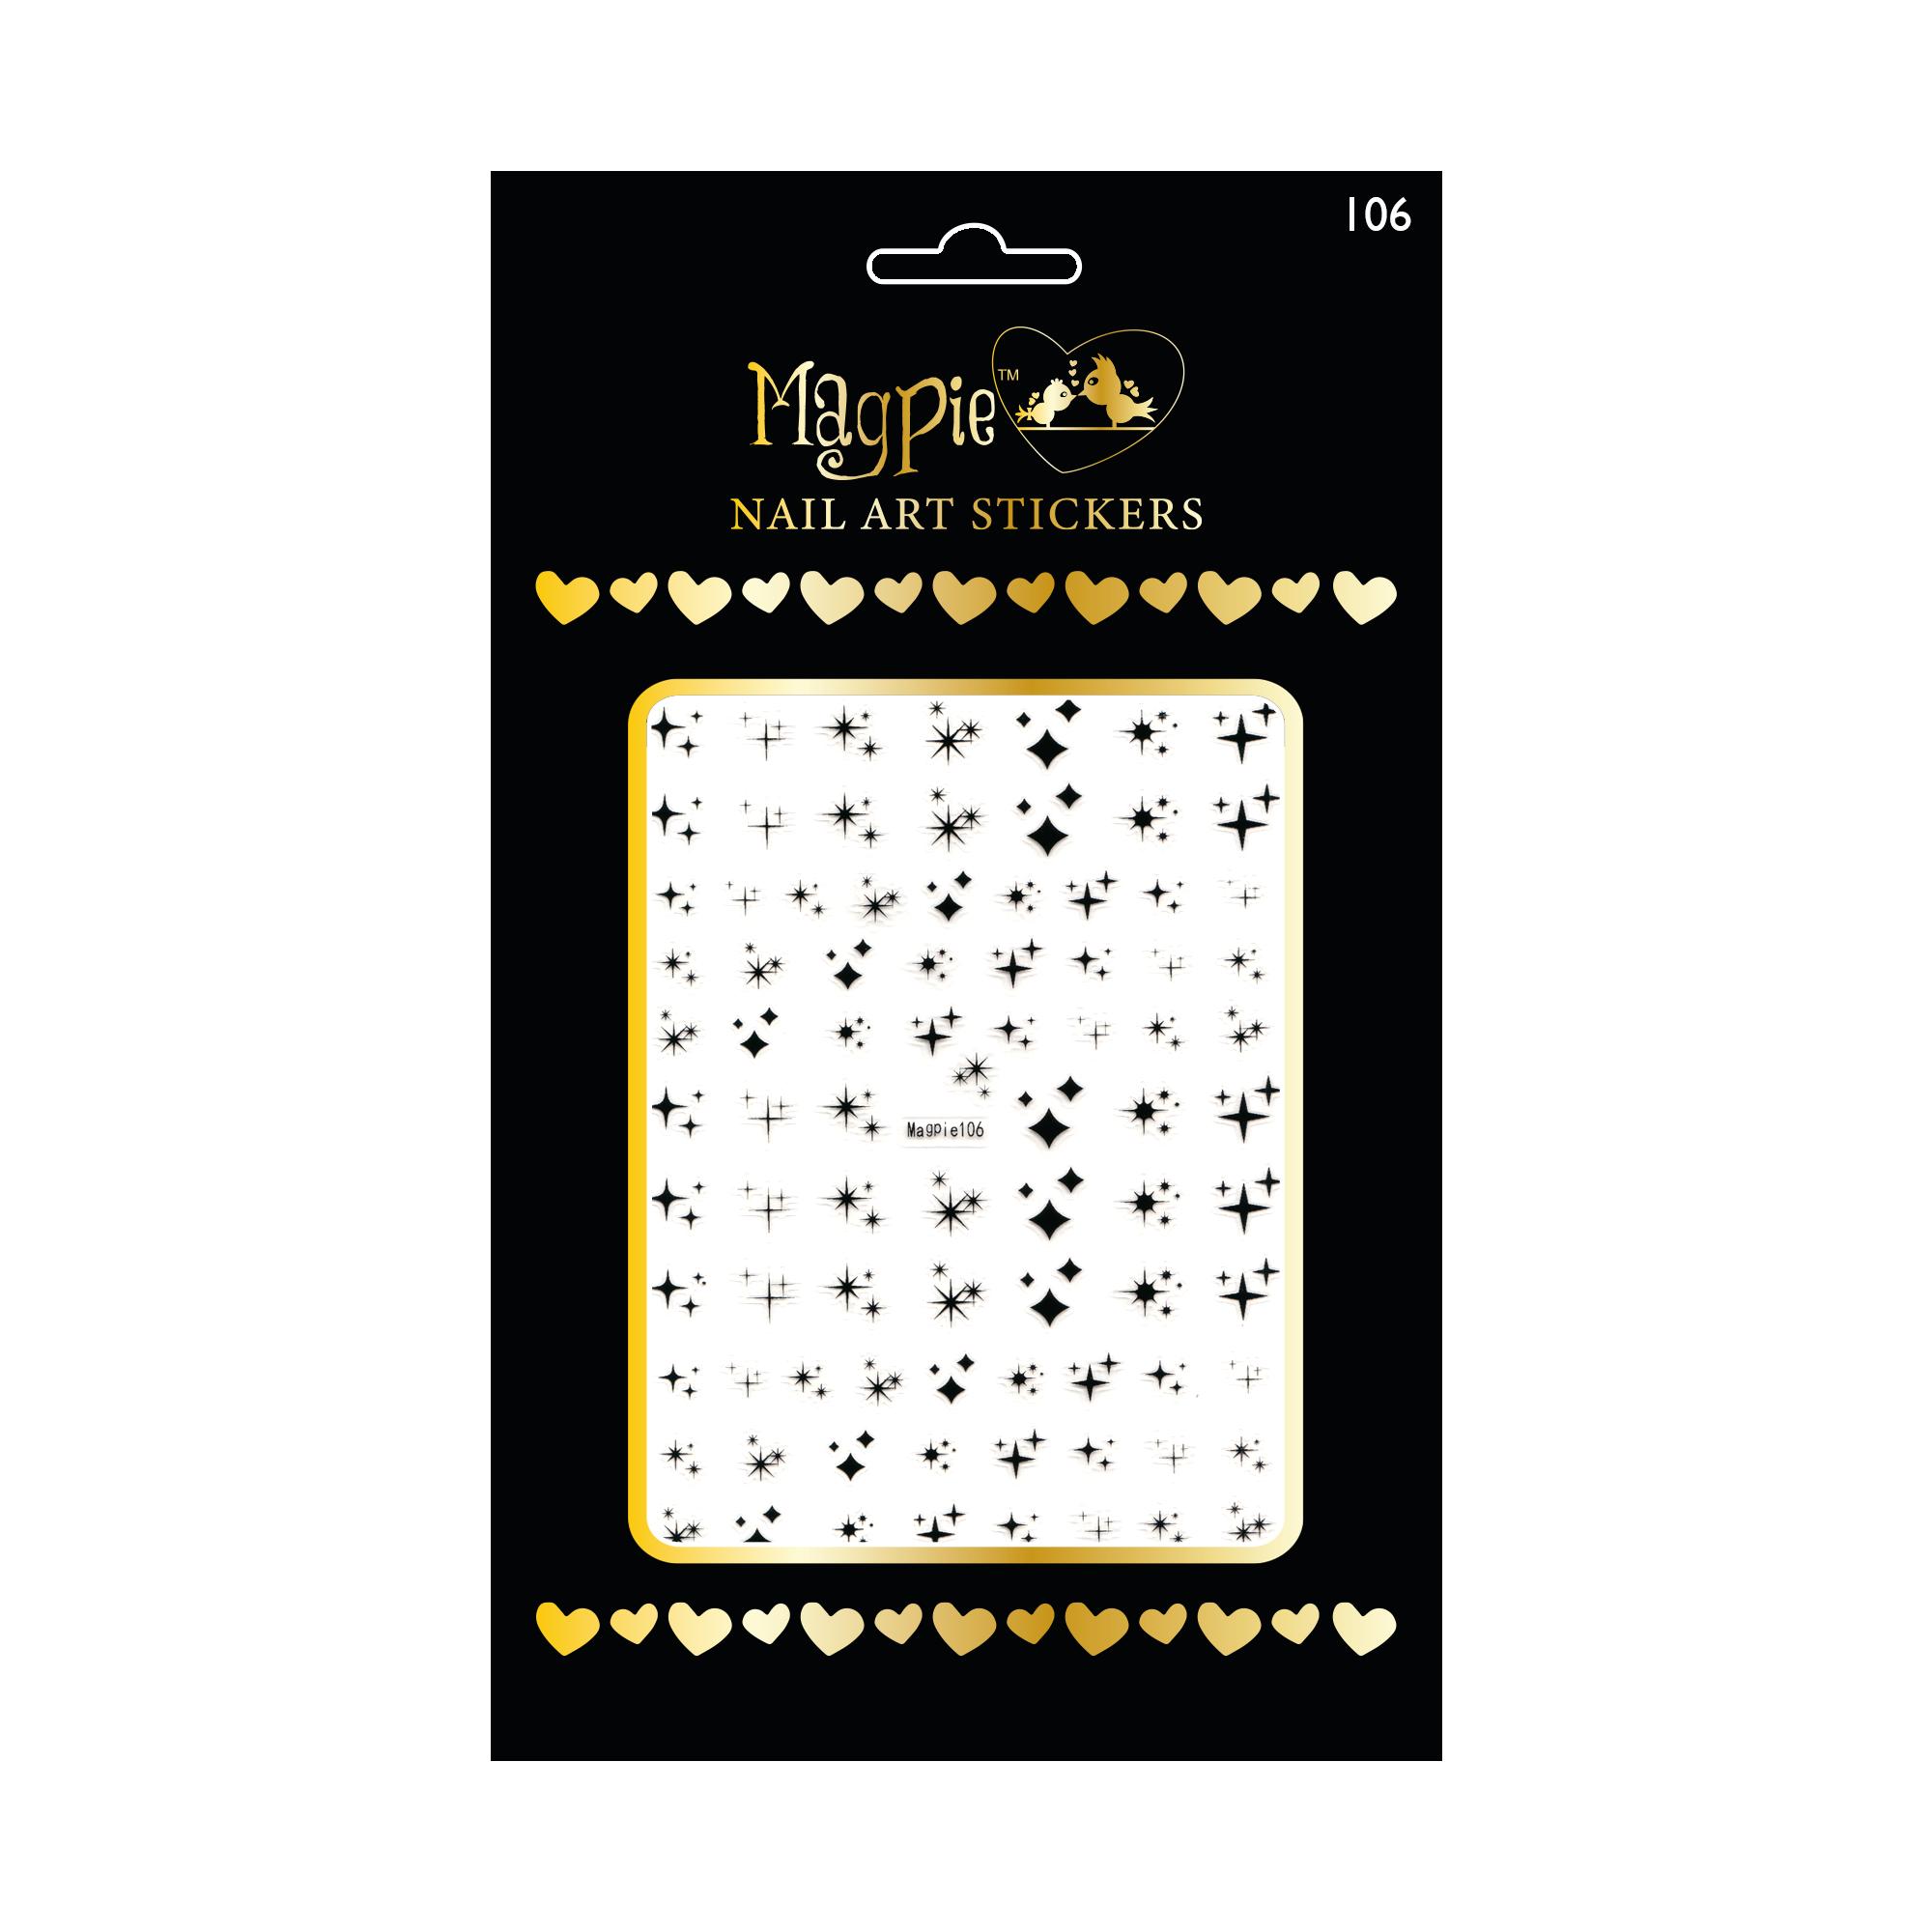 Magpie 106 stickers